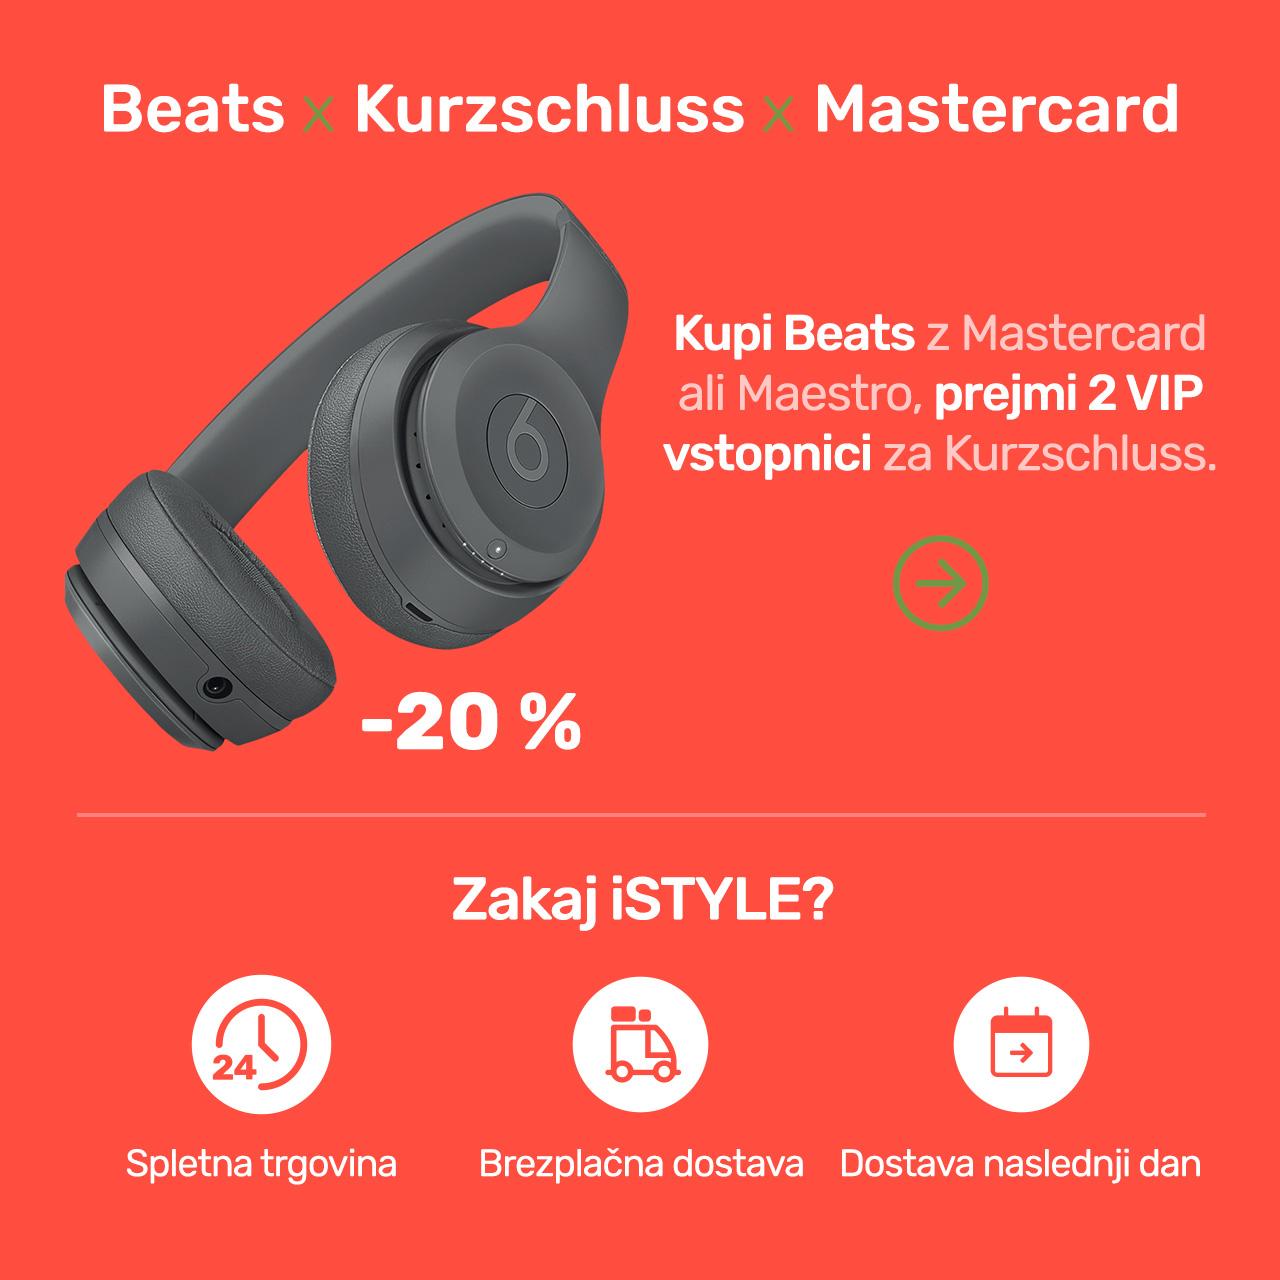 Beats x Kurzschluss x Mastercard